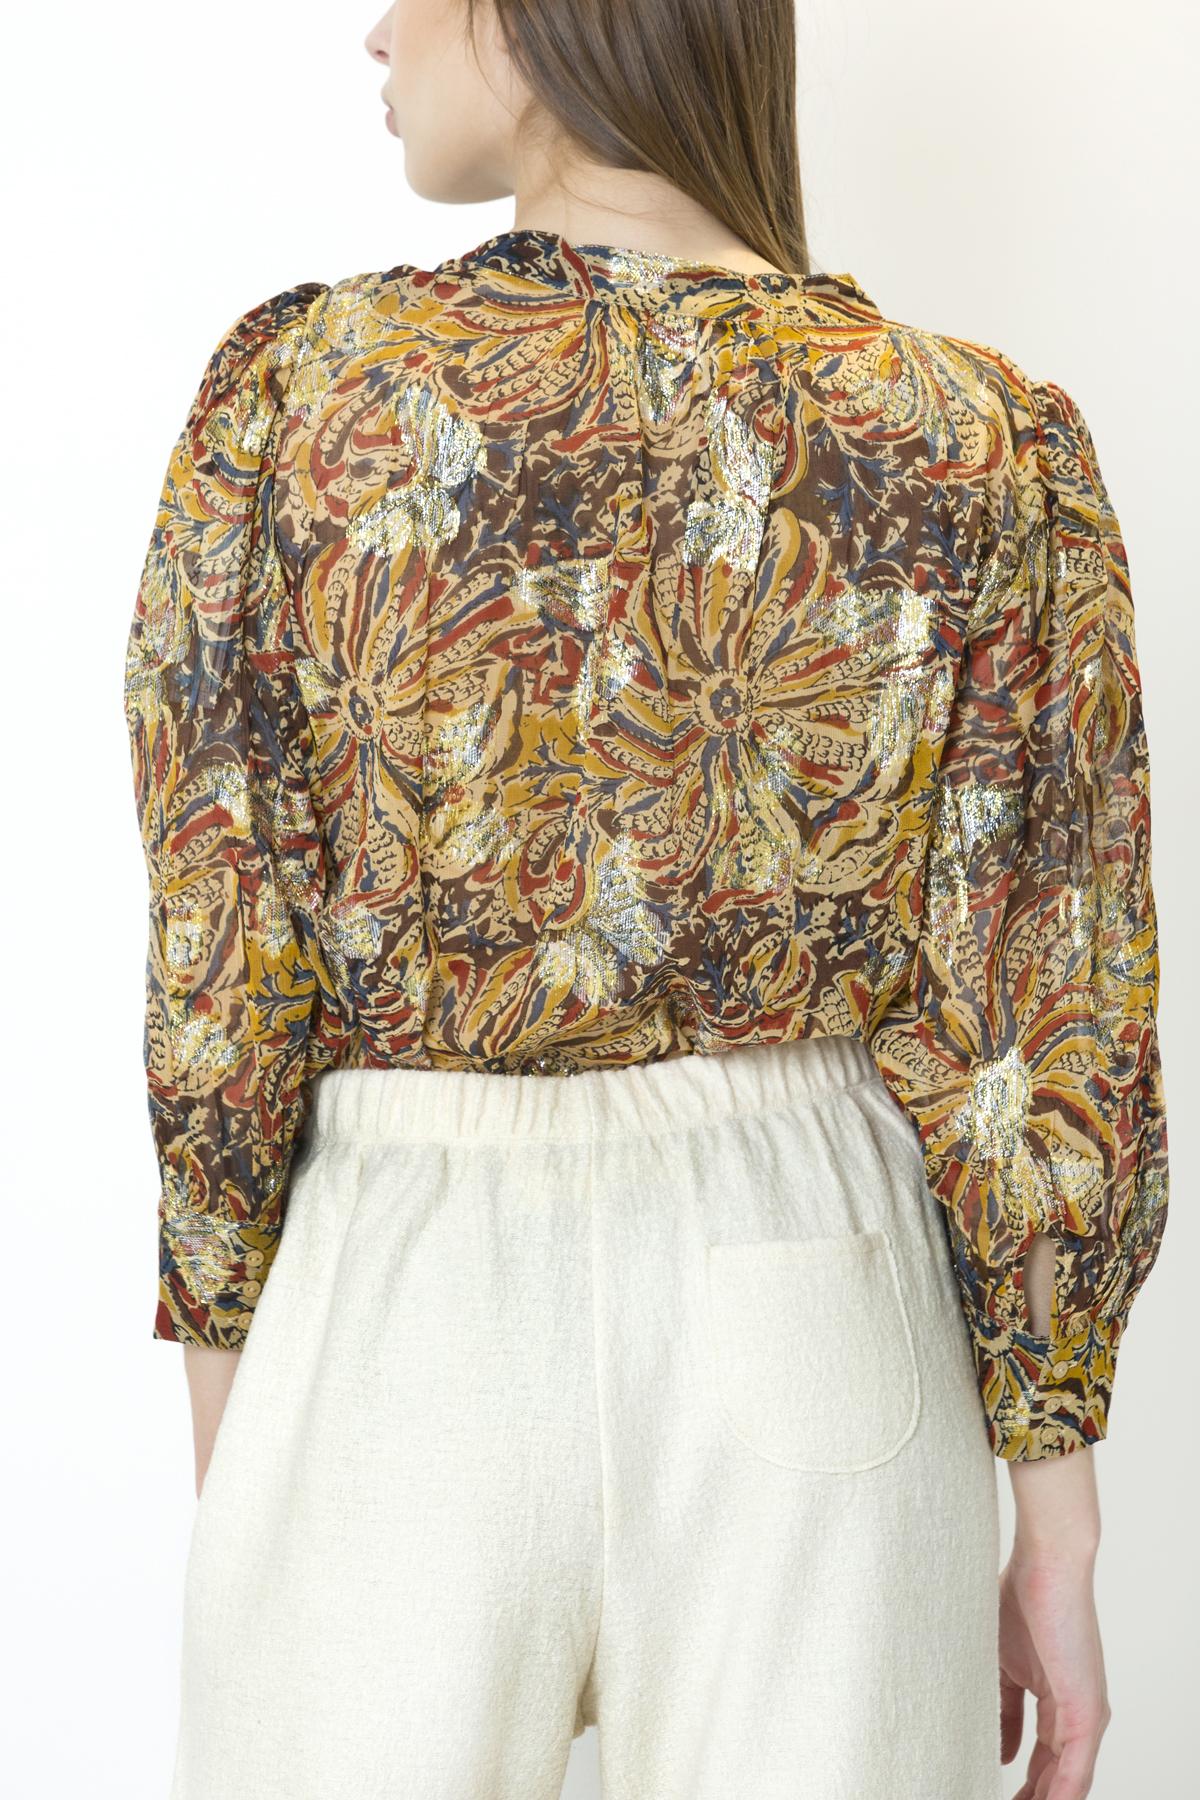 quincy-shirt-blouse-shiny-bash-matchboxathens